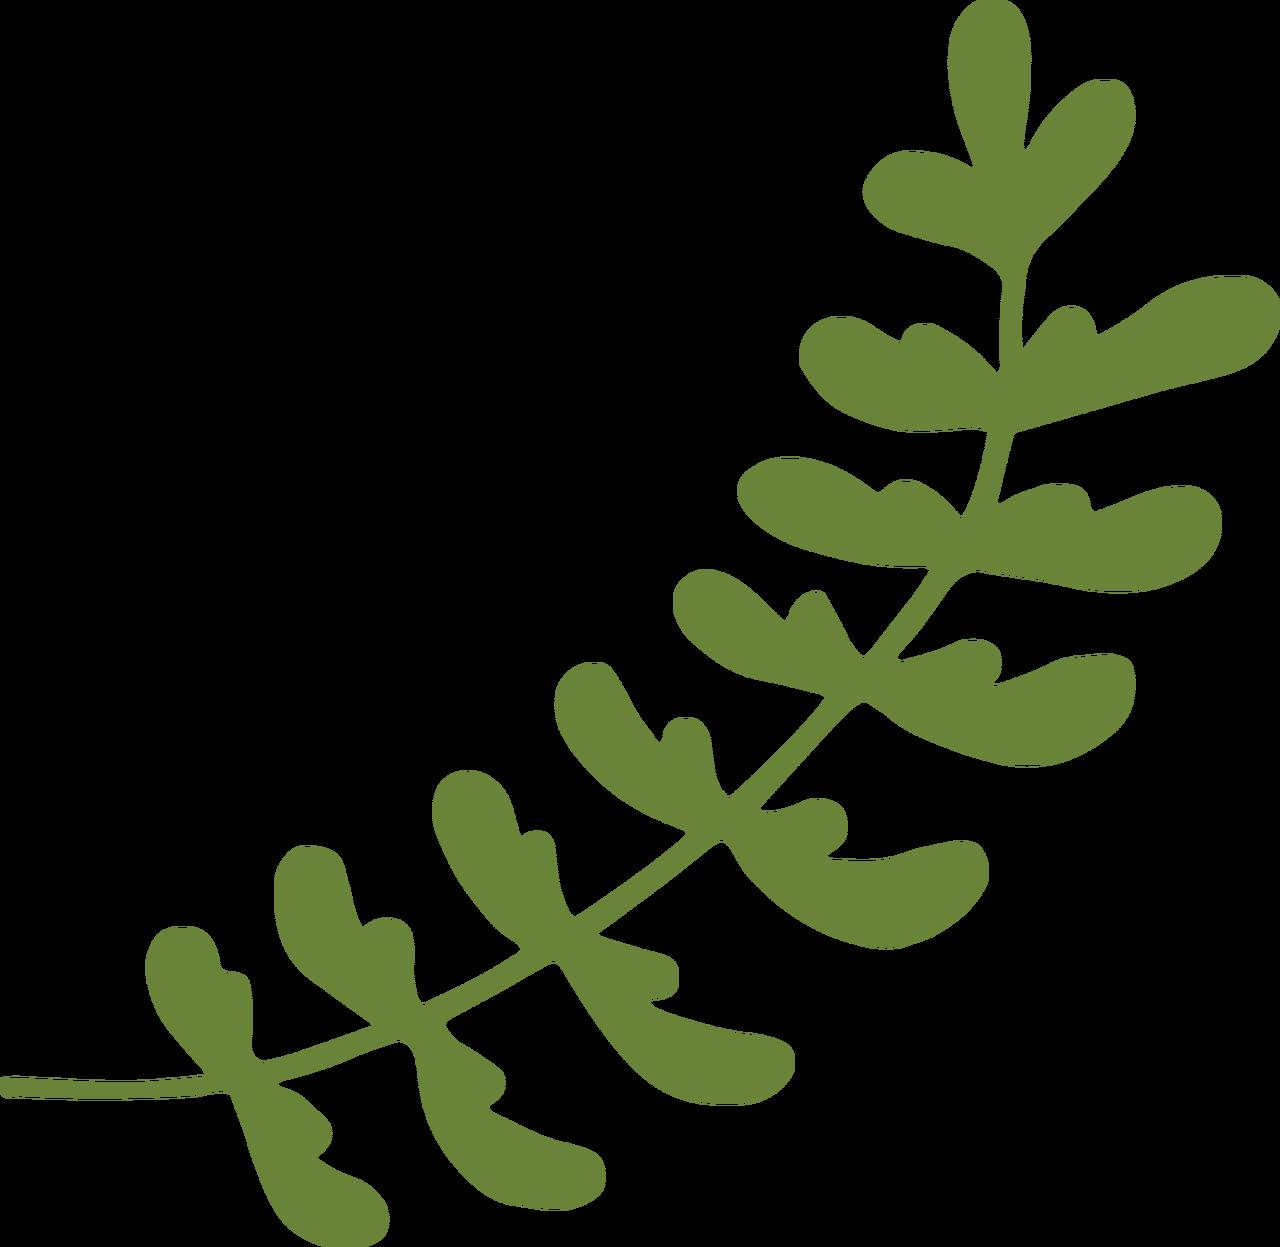 Wedding Leaves SVG Cut File